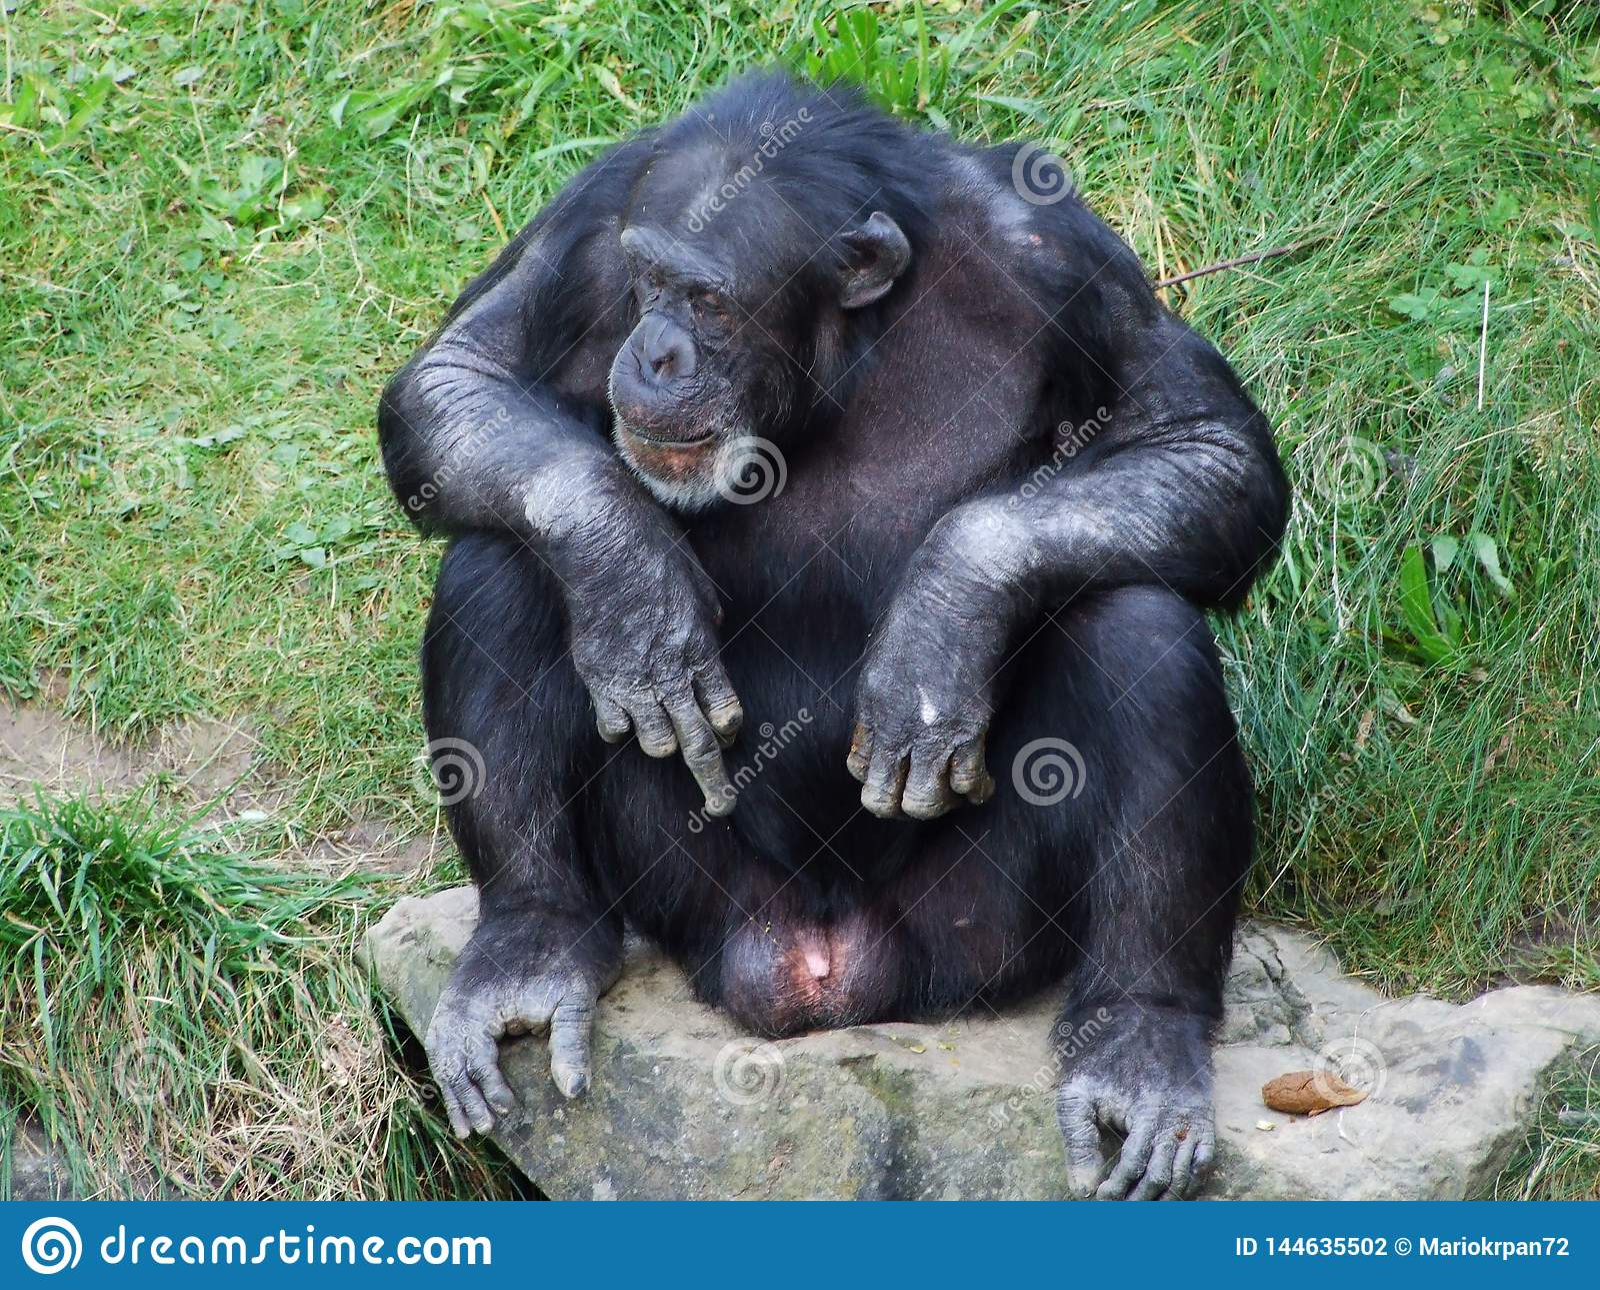 Troglodytes лотка шимпанзе, также общий шимпанзе, крепкий шимпанзе, шимпанзе или Der Schimpanse, зоопарк Abenteurland Вальтер